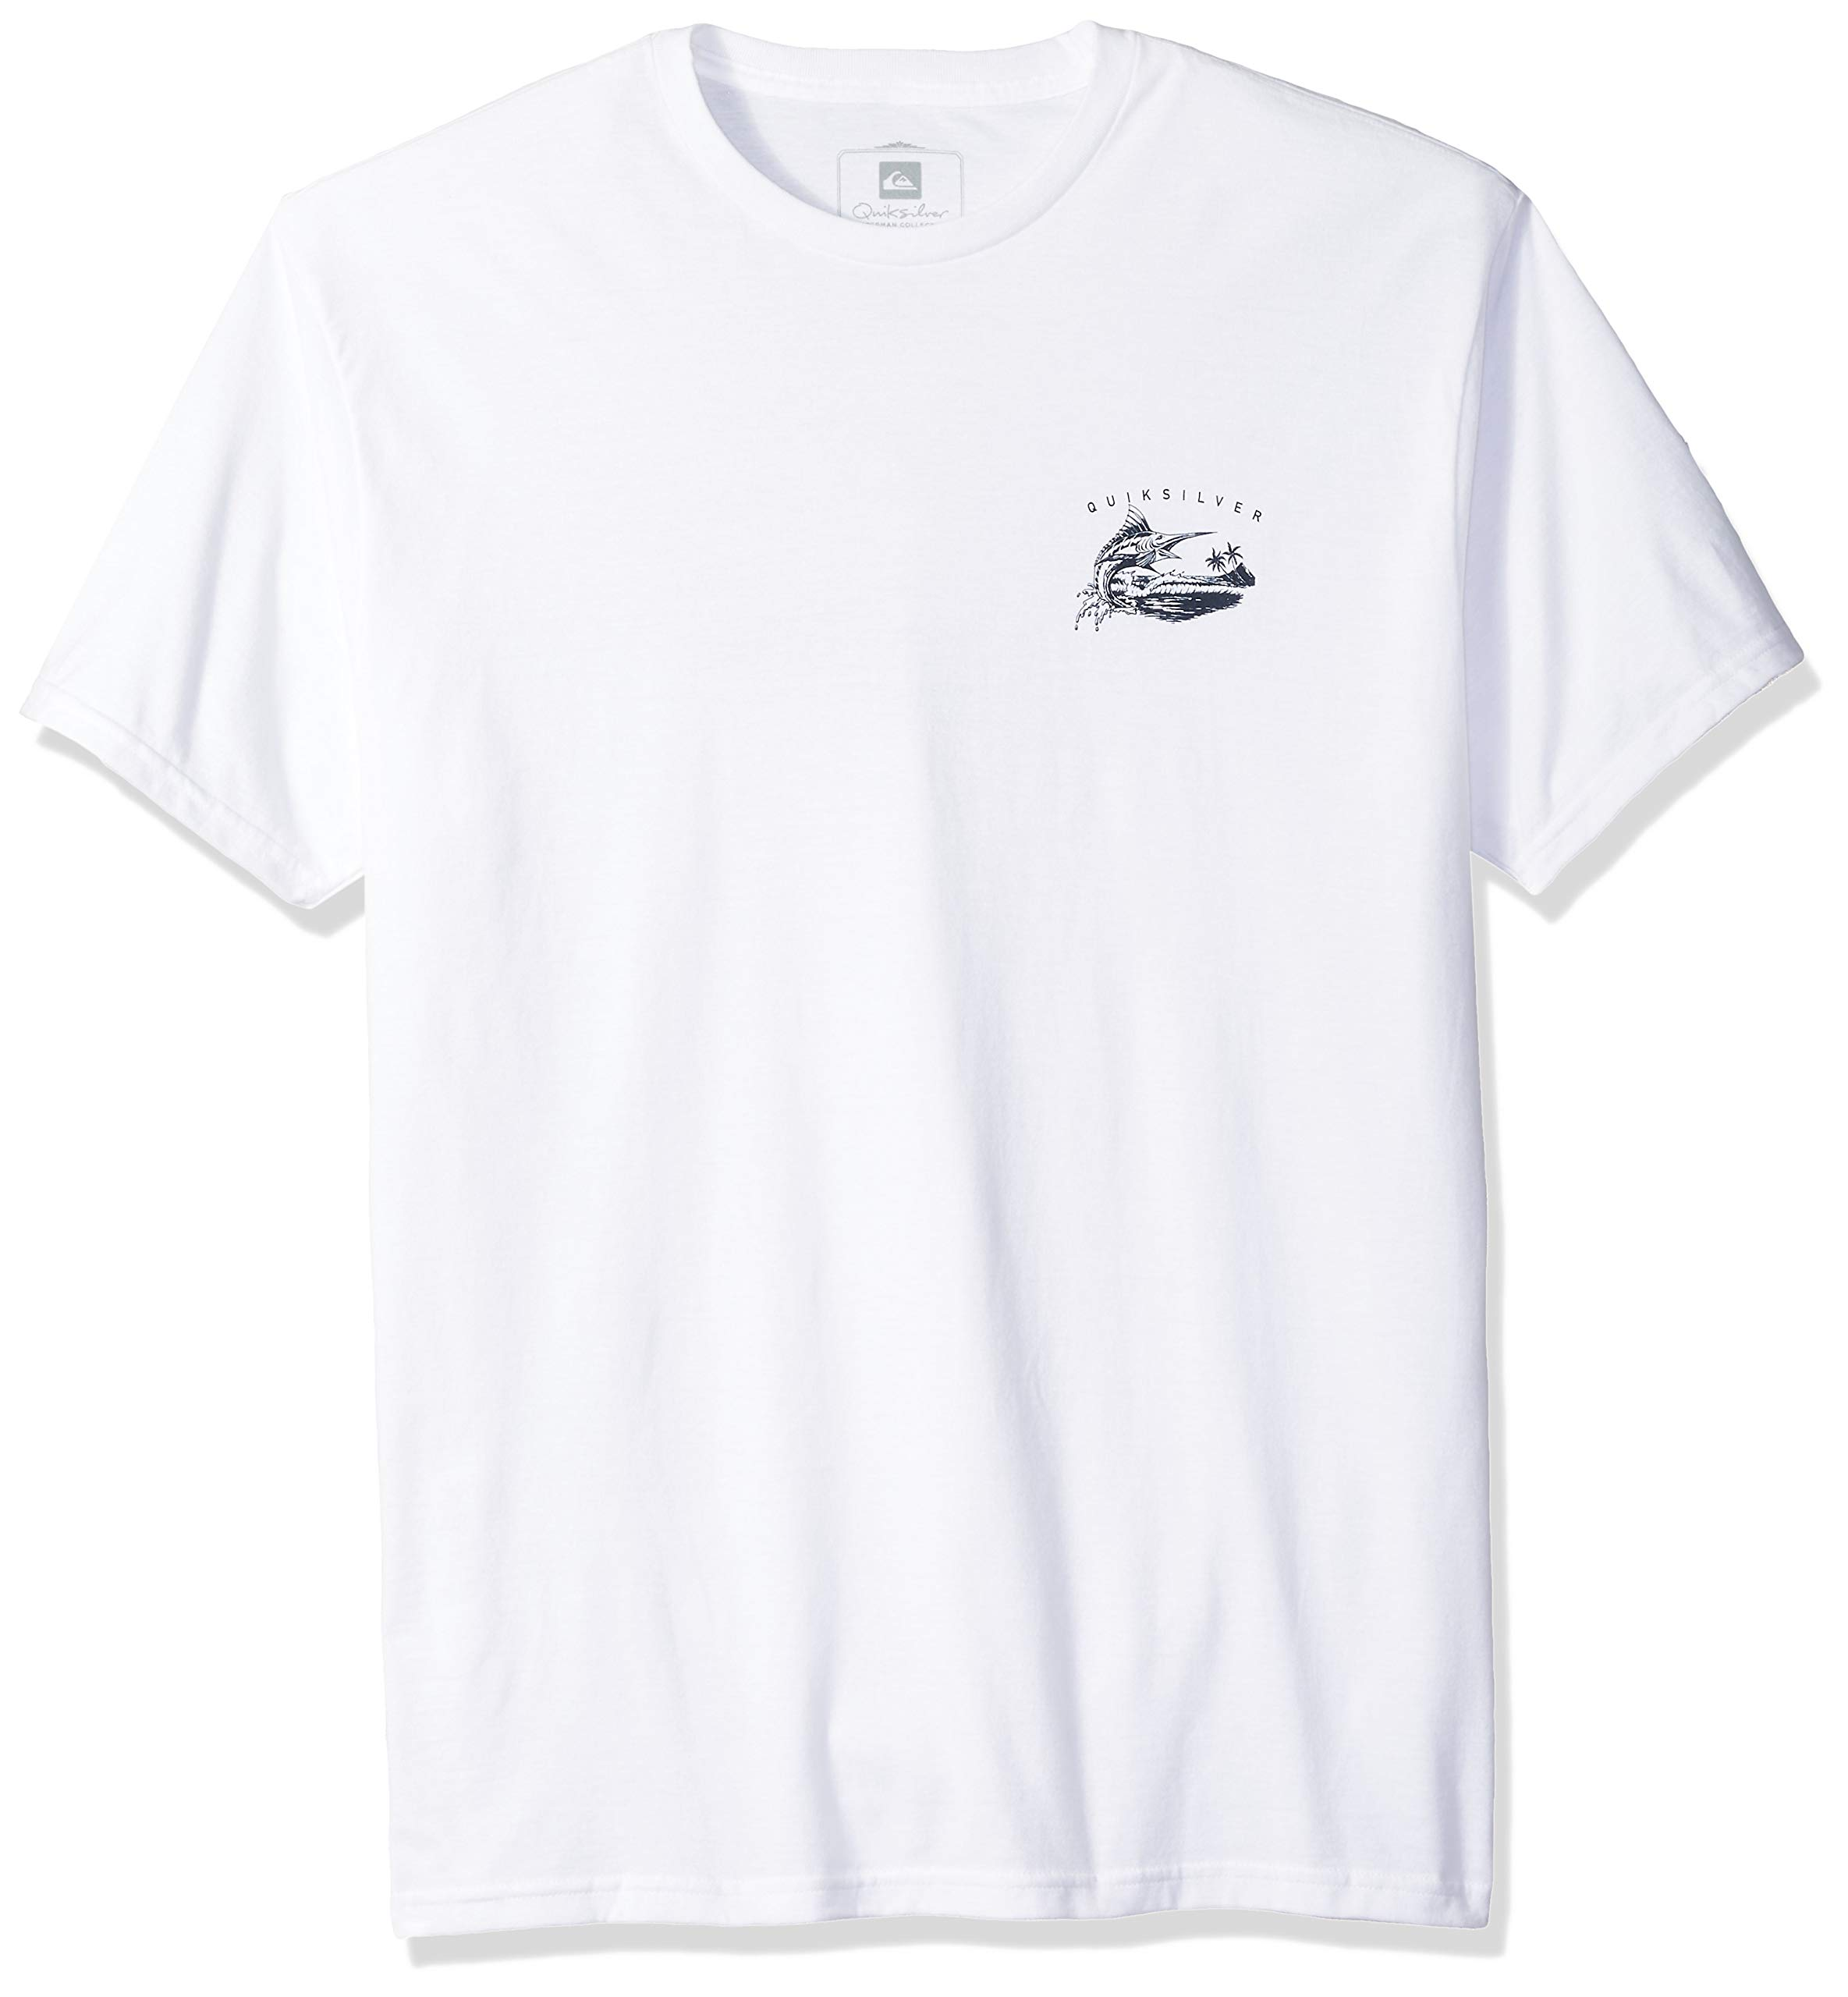 Quiksilver Men's The Jumper TEE Shirt, White, L